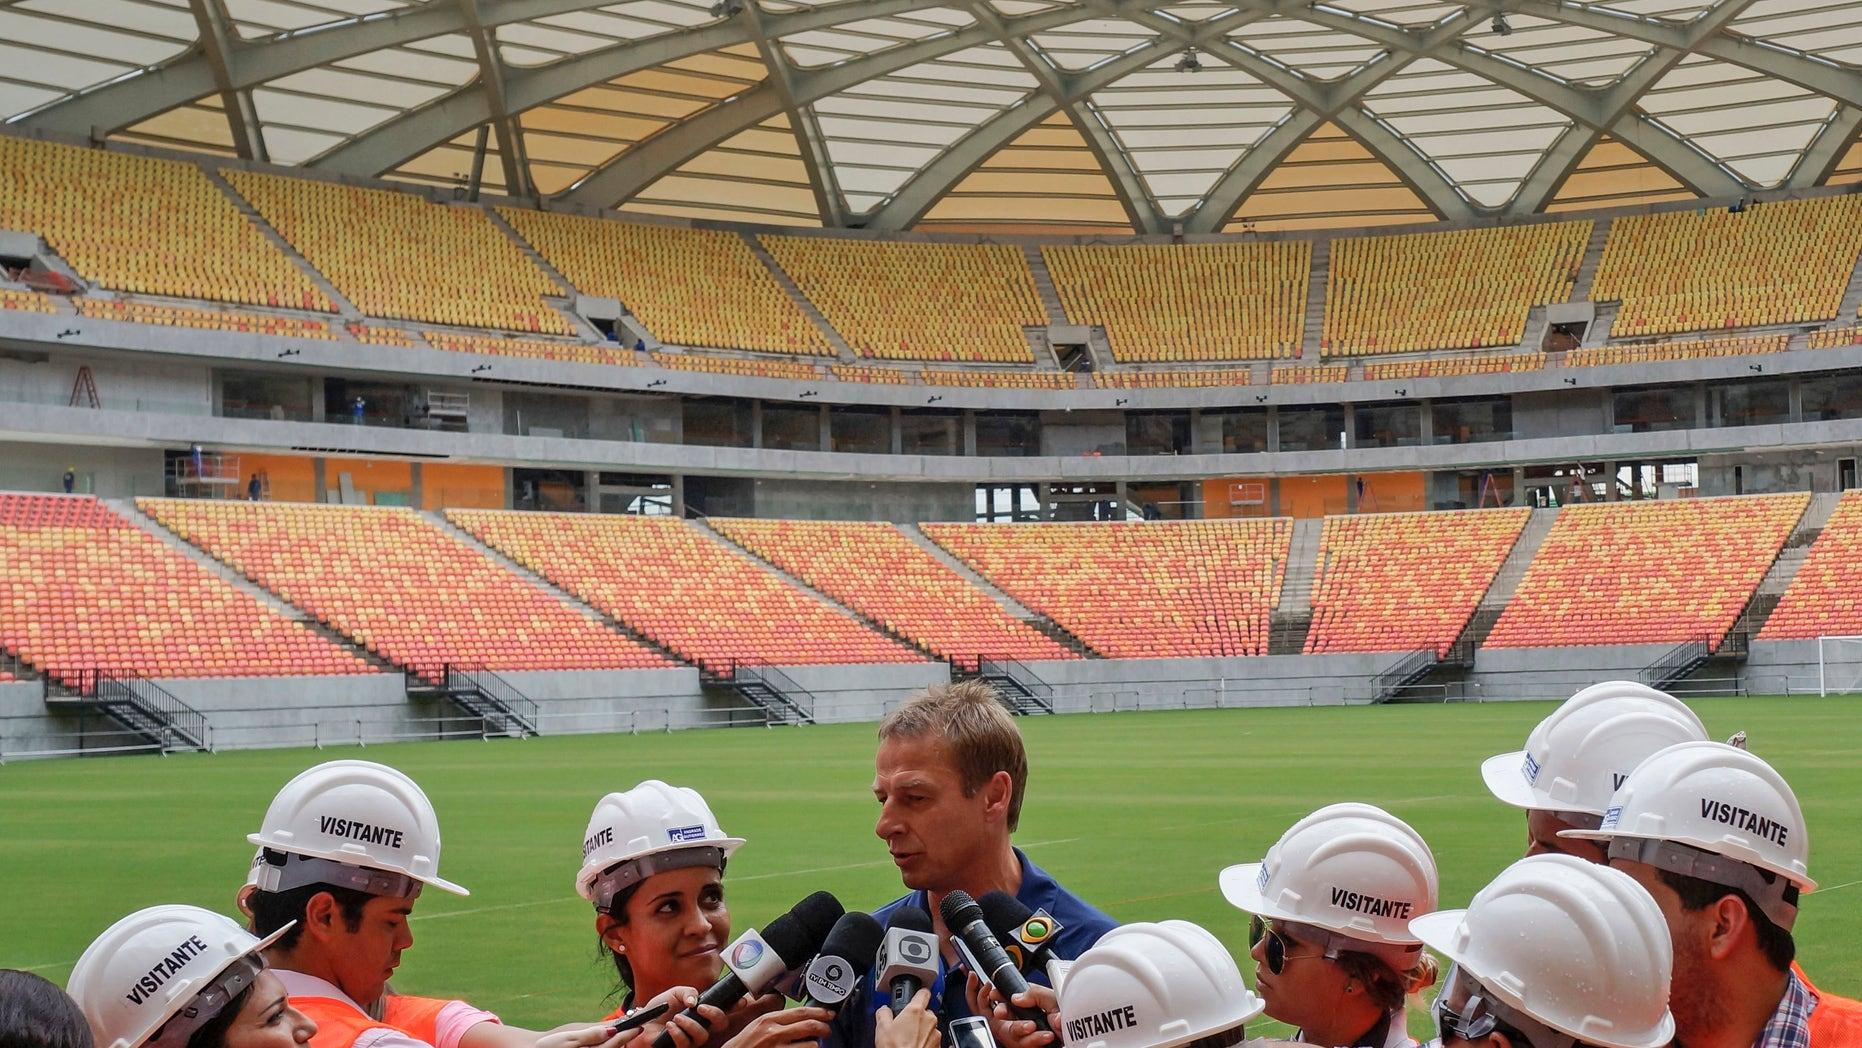 Jan. 24, 2014: Head coach of the United States soccer team, Jurgen Klinsmann, from Germany, talks with the press inside Arena da Amazonia stadium in Manaus, Brazil.